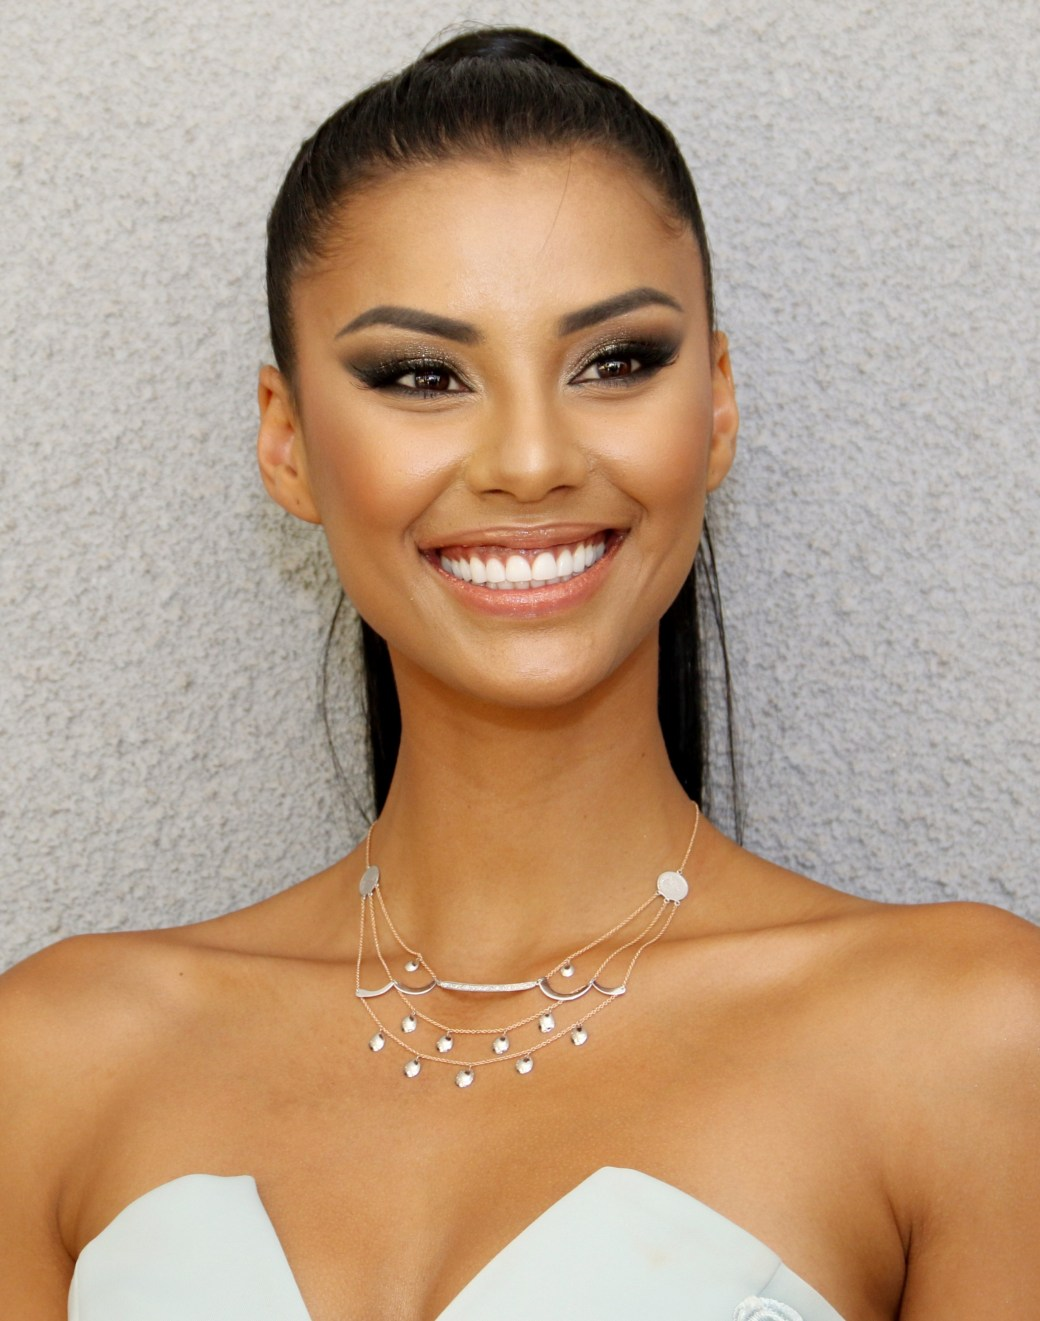 Miss South Africa Tamaryn_Green - PeanutGallery247